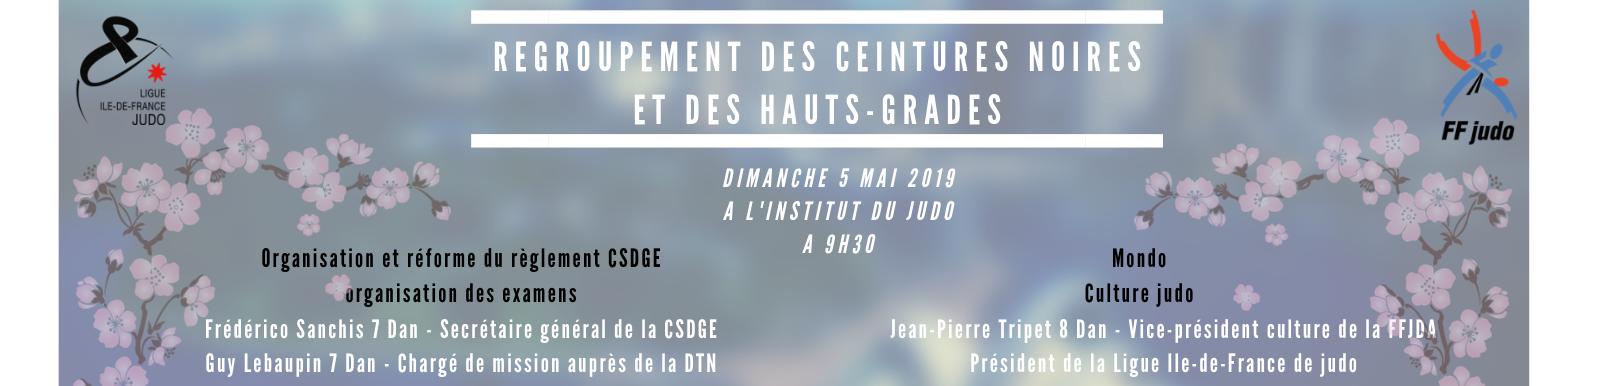 2019_Regroupement_CN_HG